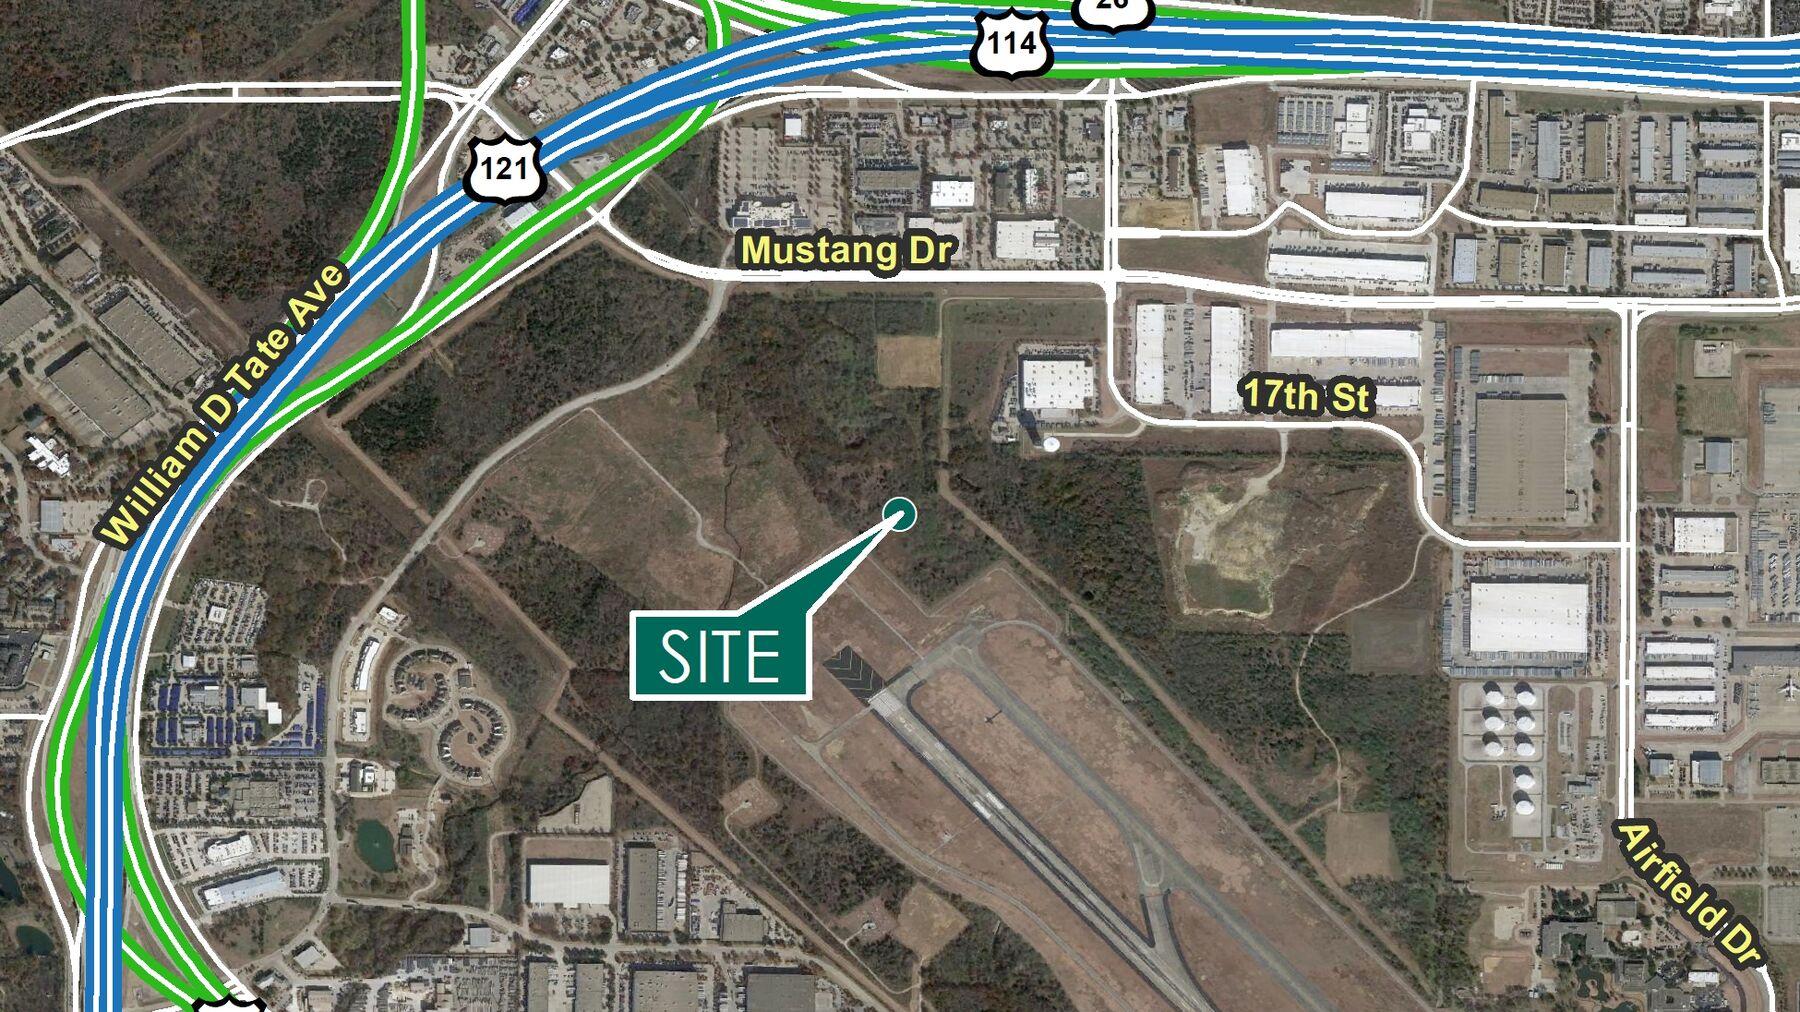 DPM-Prologis-DFW-Mustang-Park-Building-2-DAL06202-1001-Mustang-Drive_AerialMap.jpg